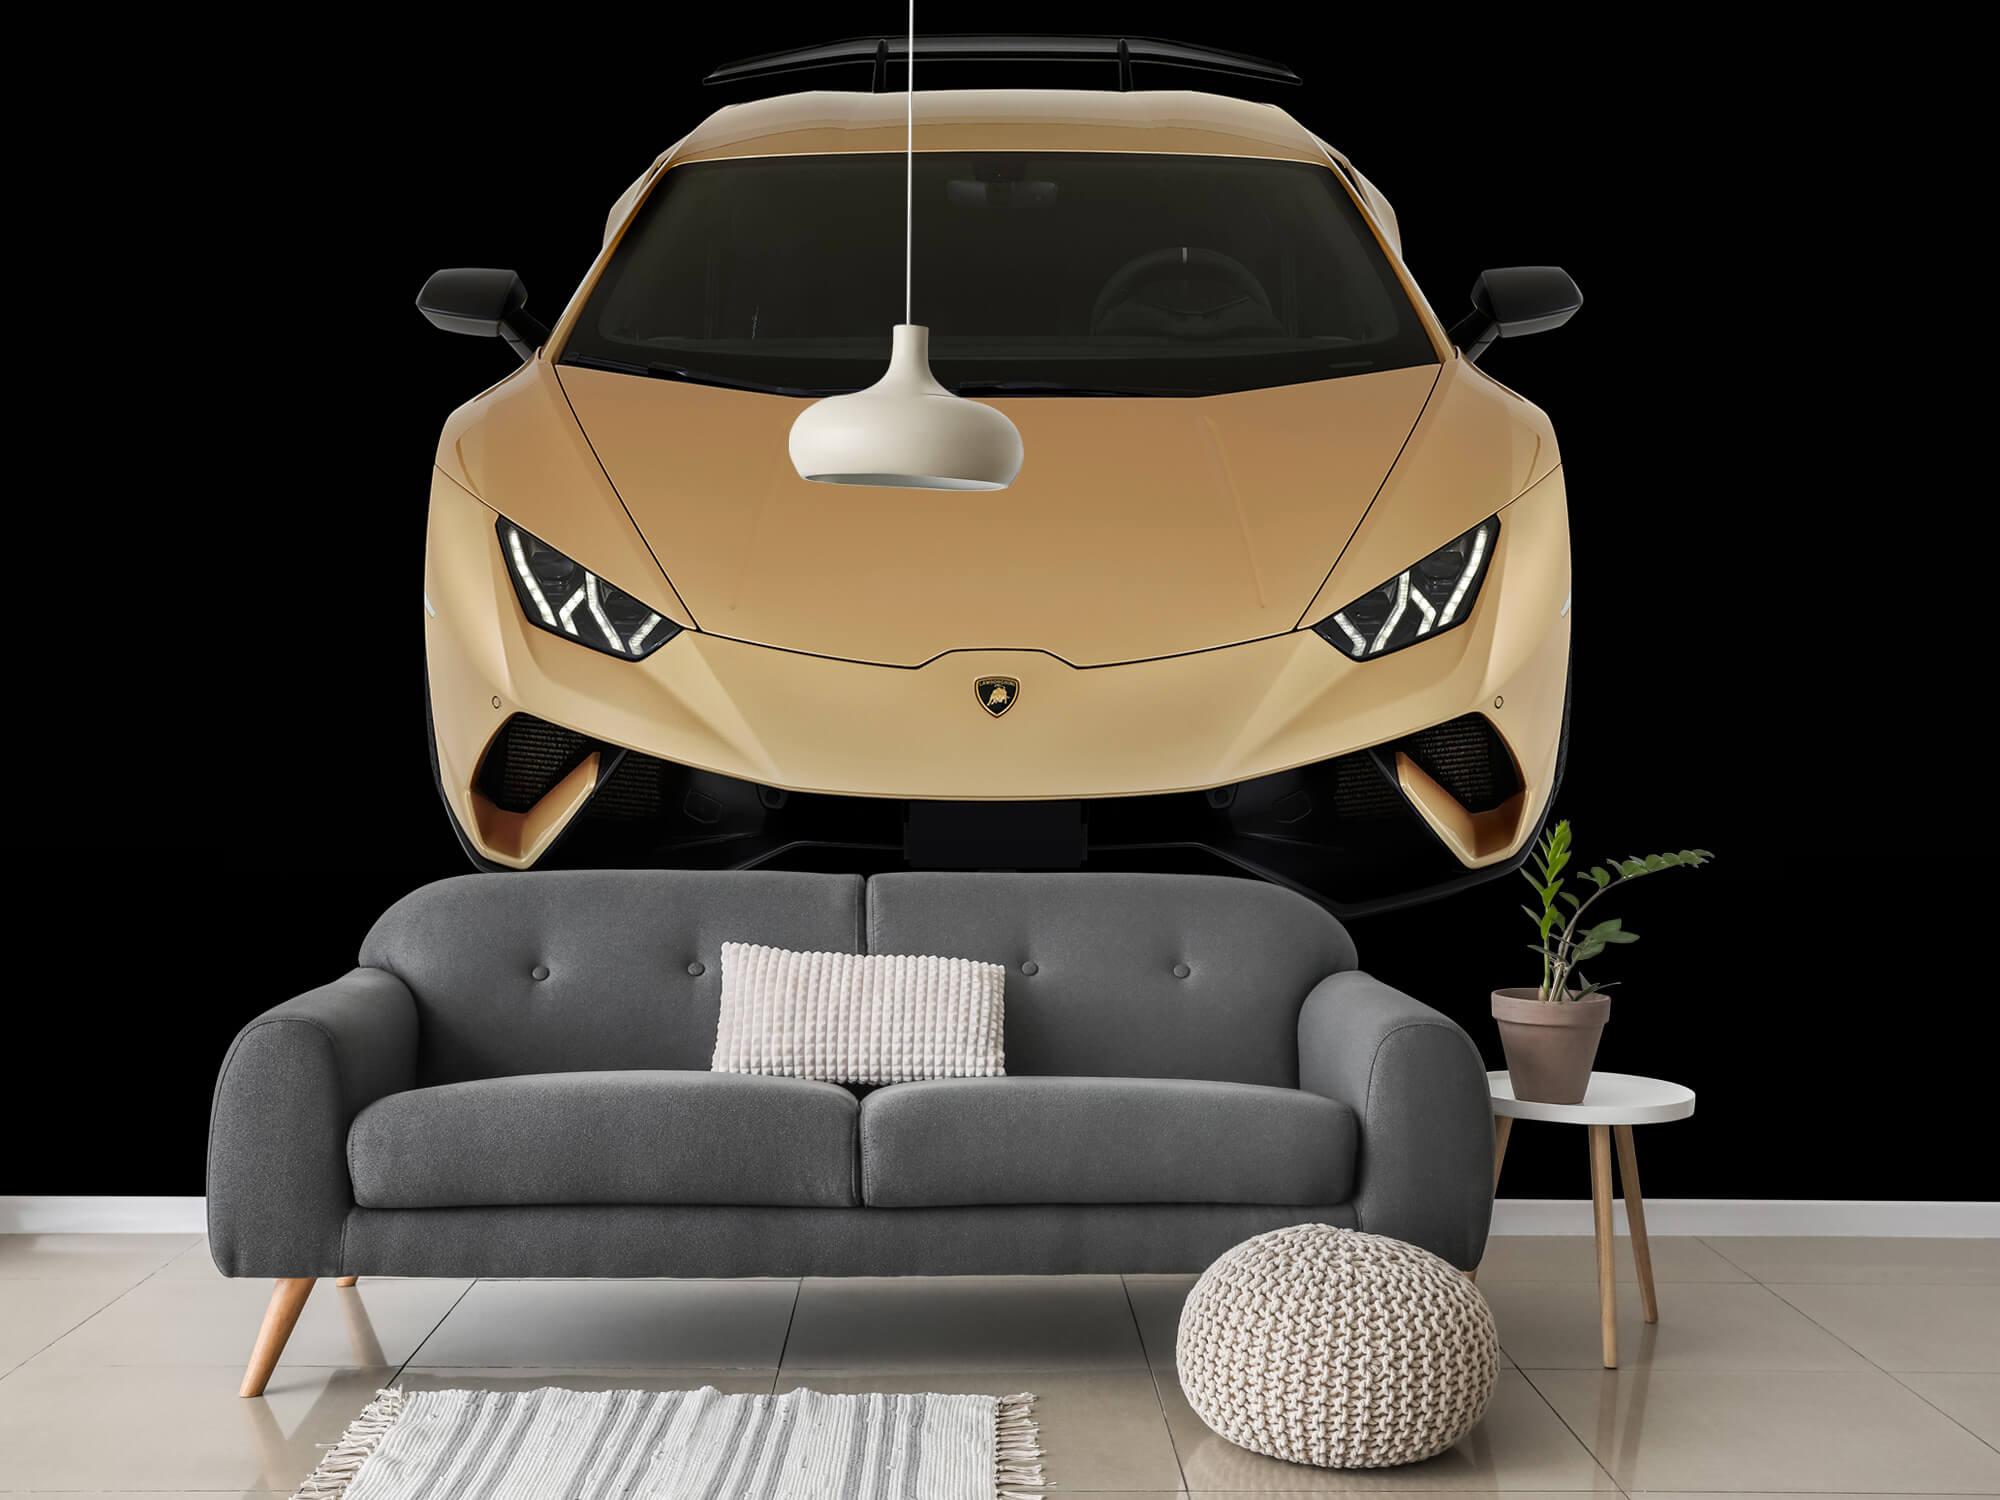 Wallpaper Lamborghini Huracán - Front from above, black 3